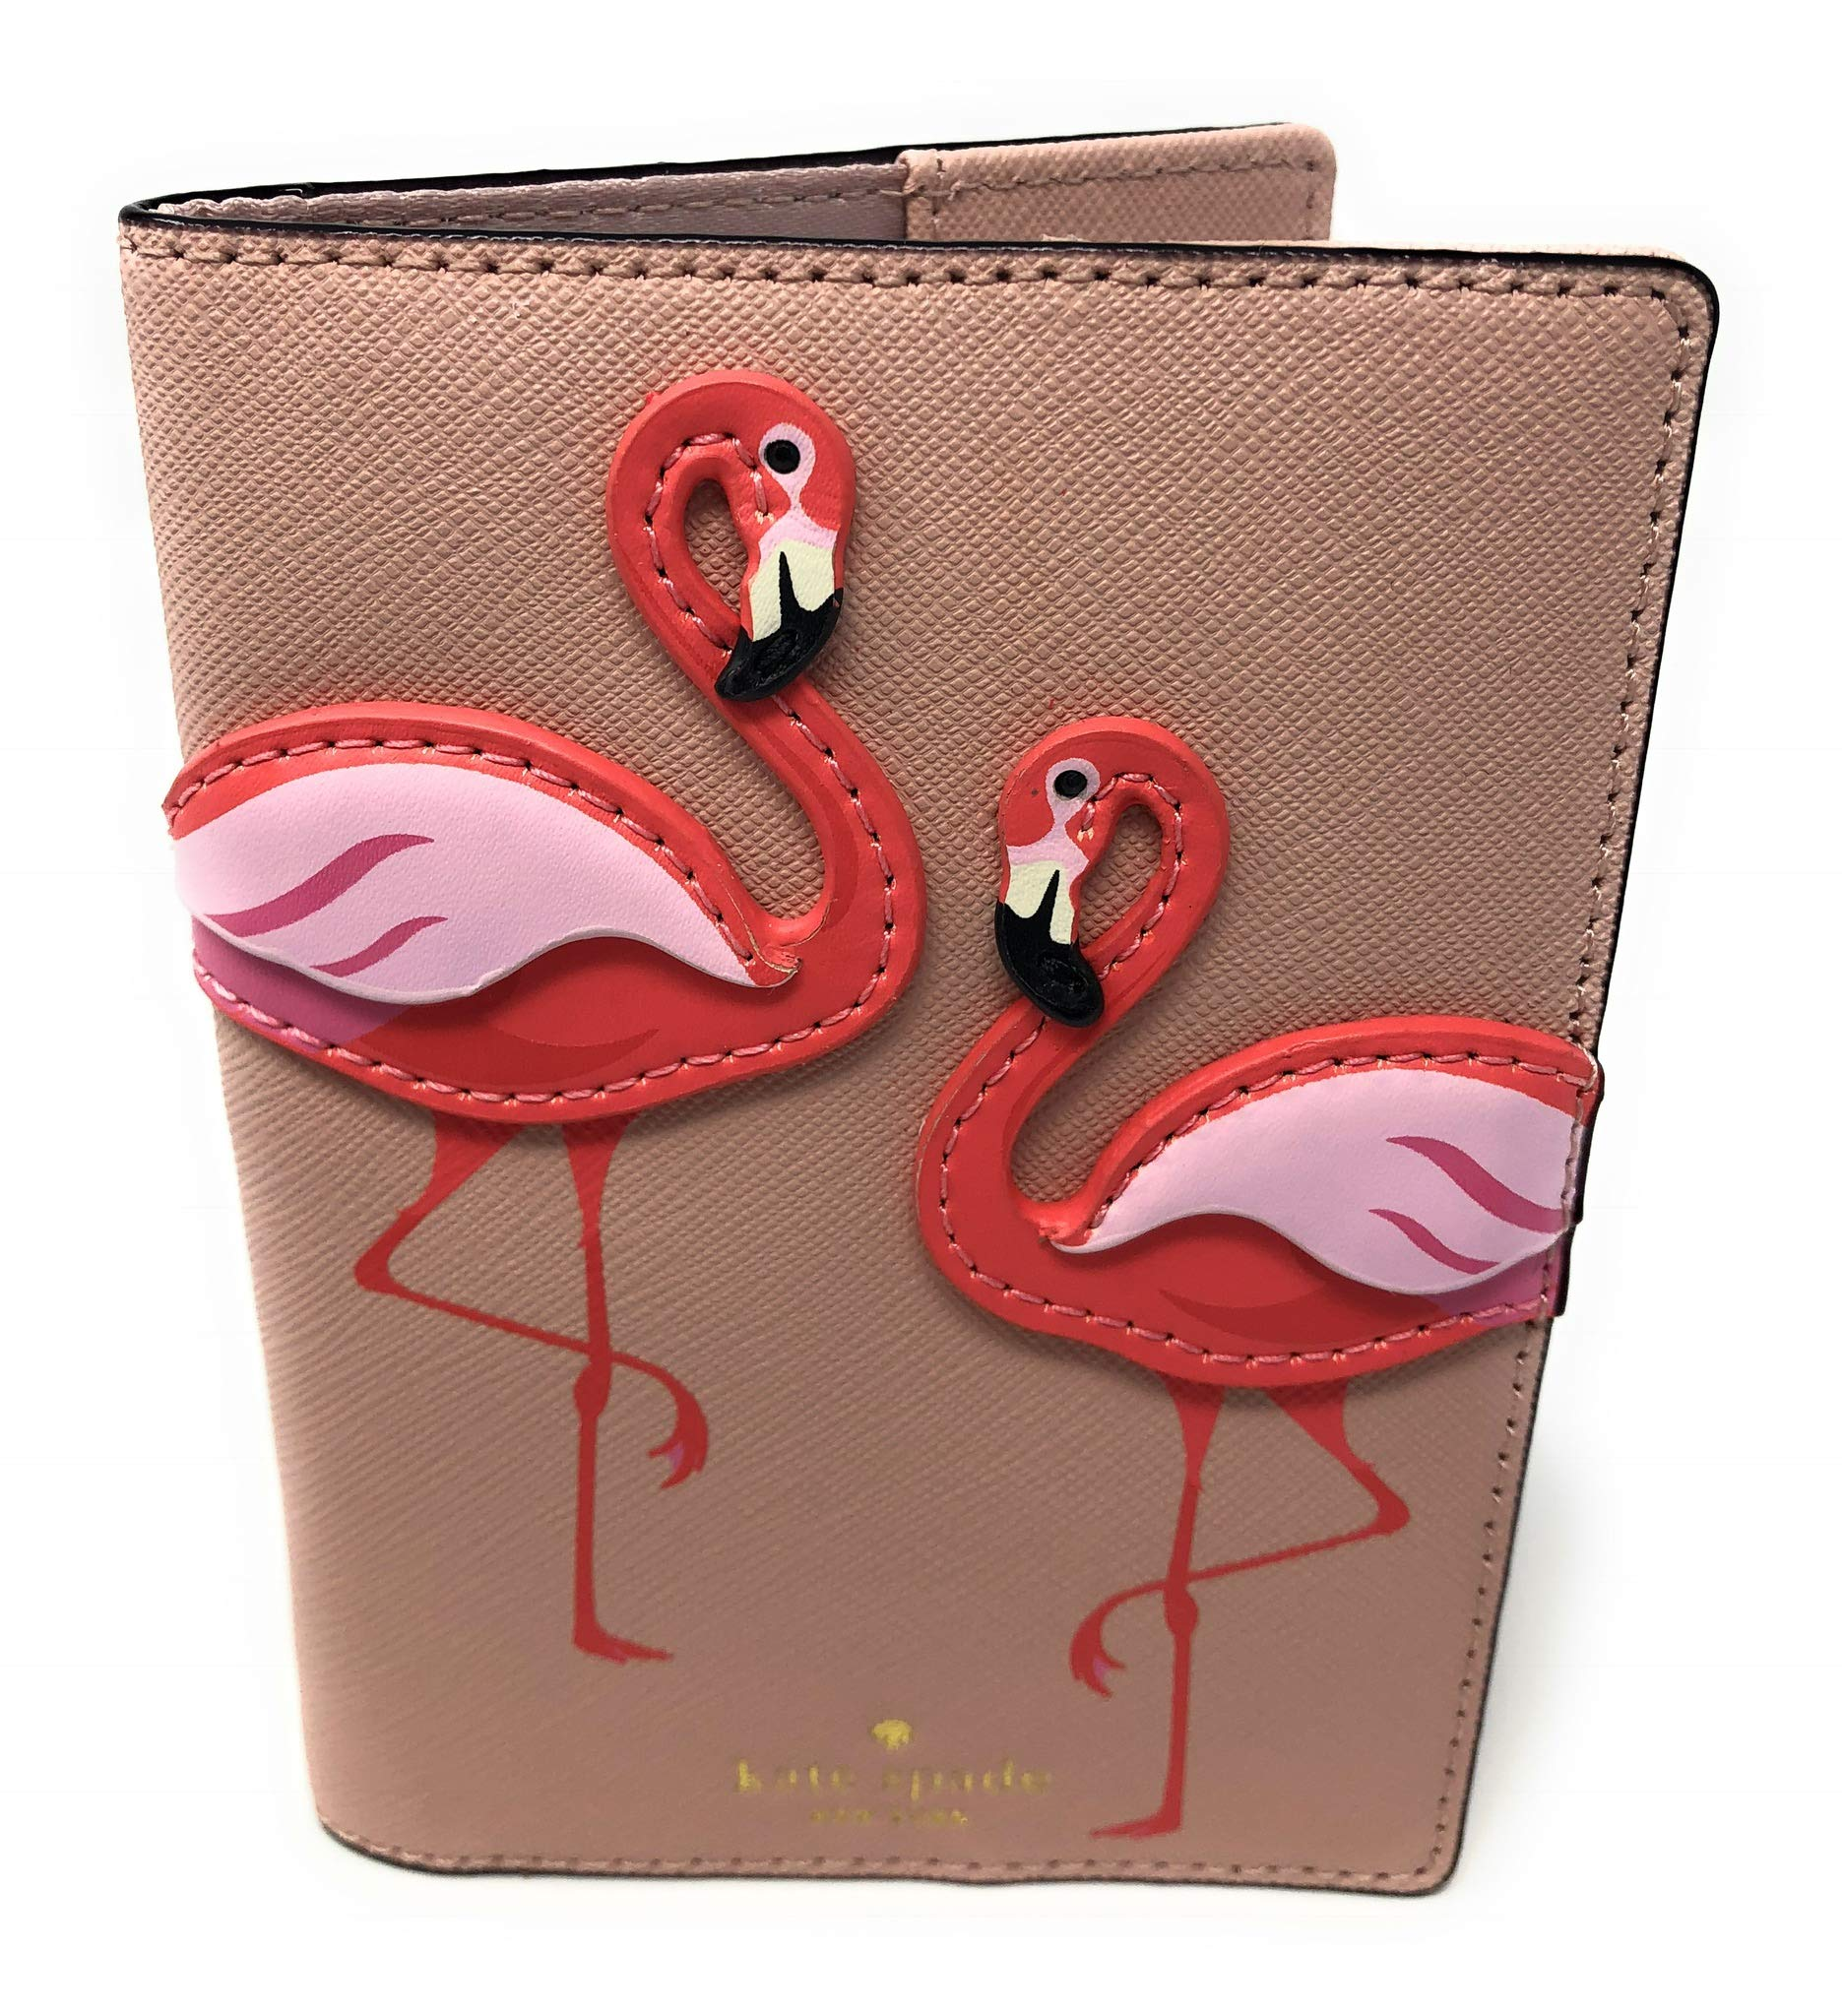 Kate Spade Saffiano Leather Flamingo Passport Holder Case Pink